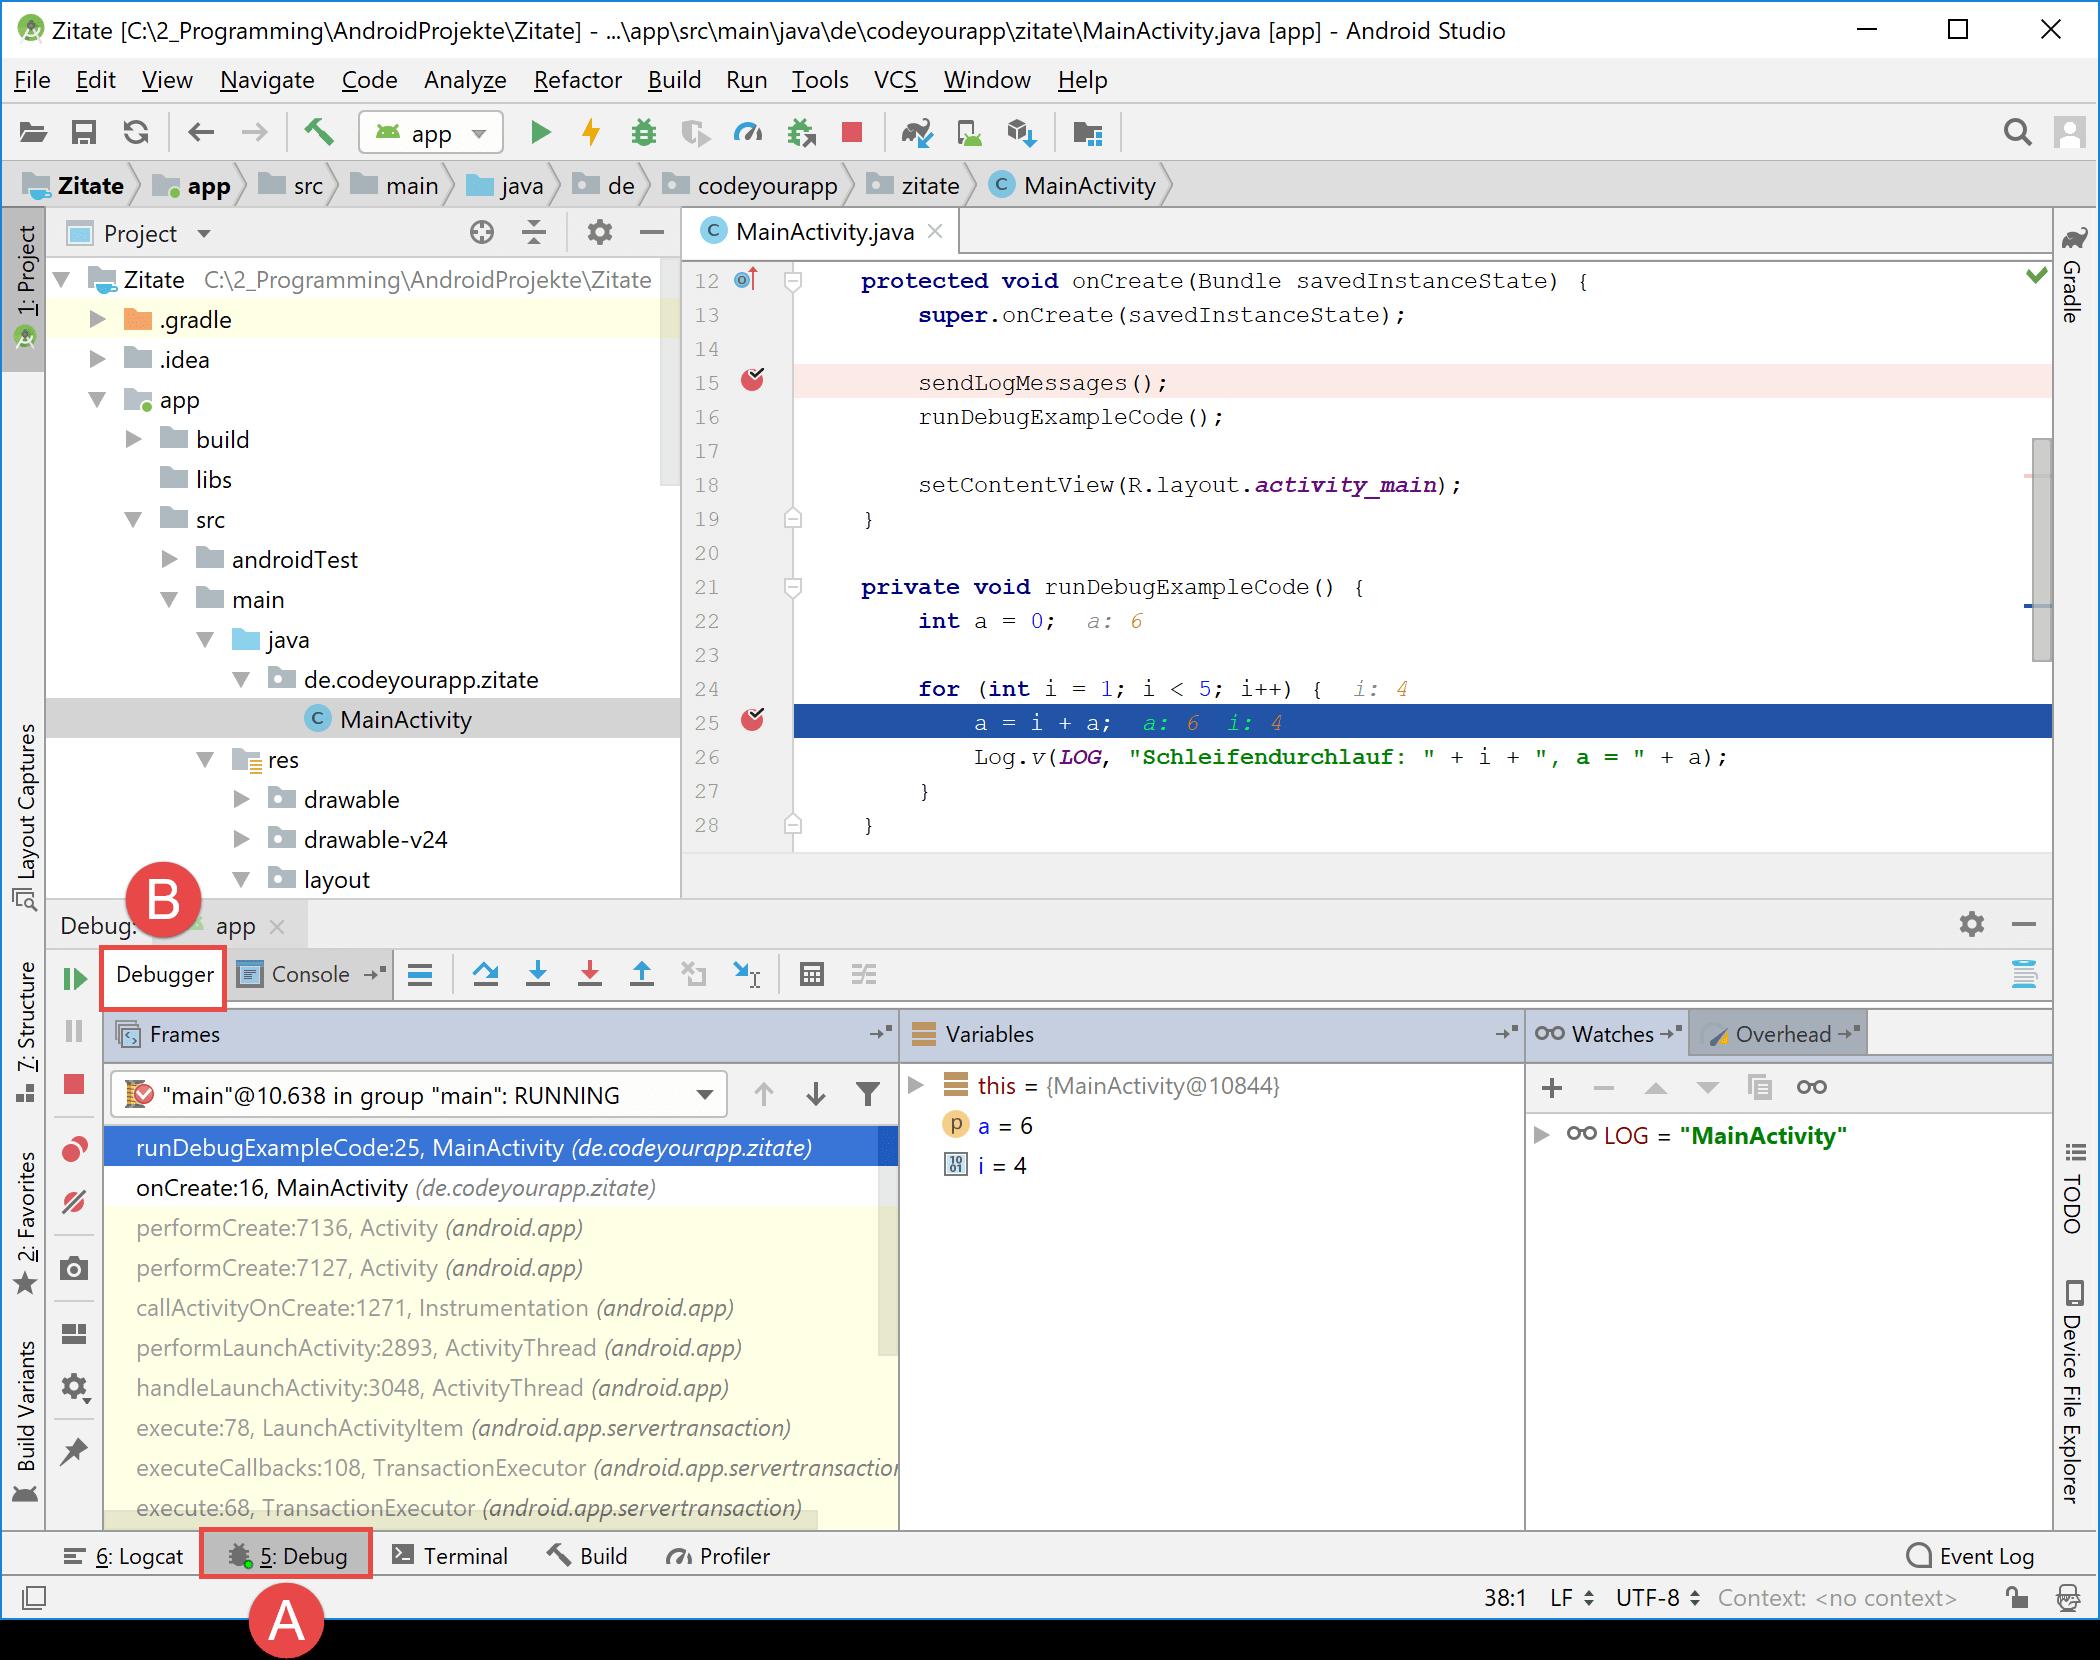 debug_tool_window